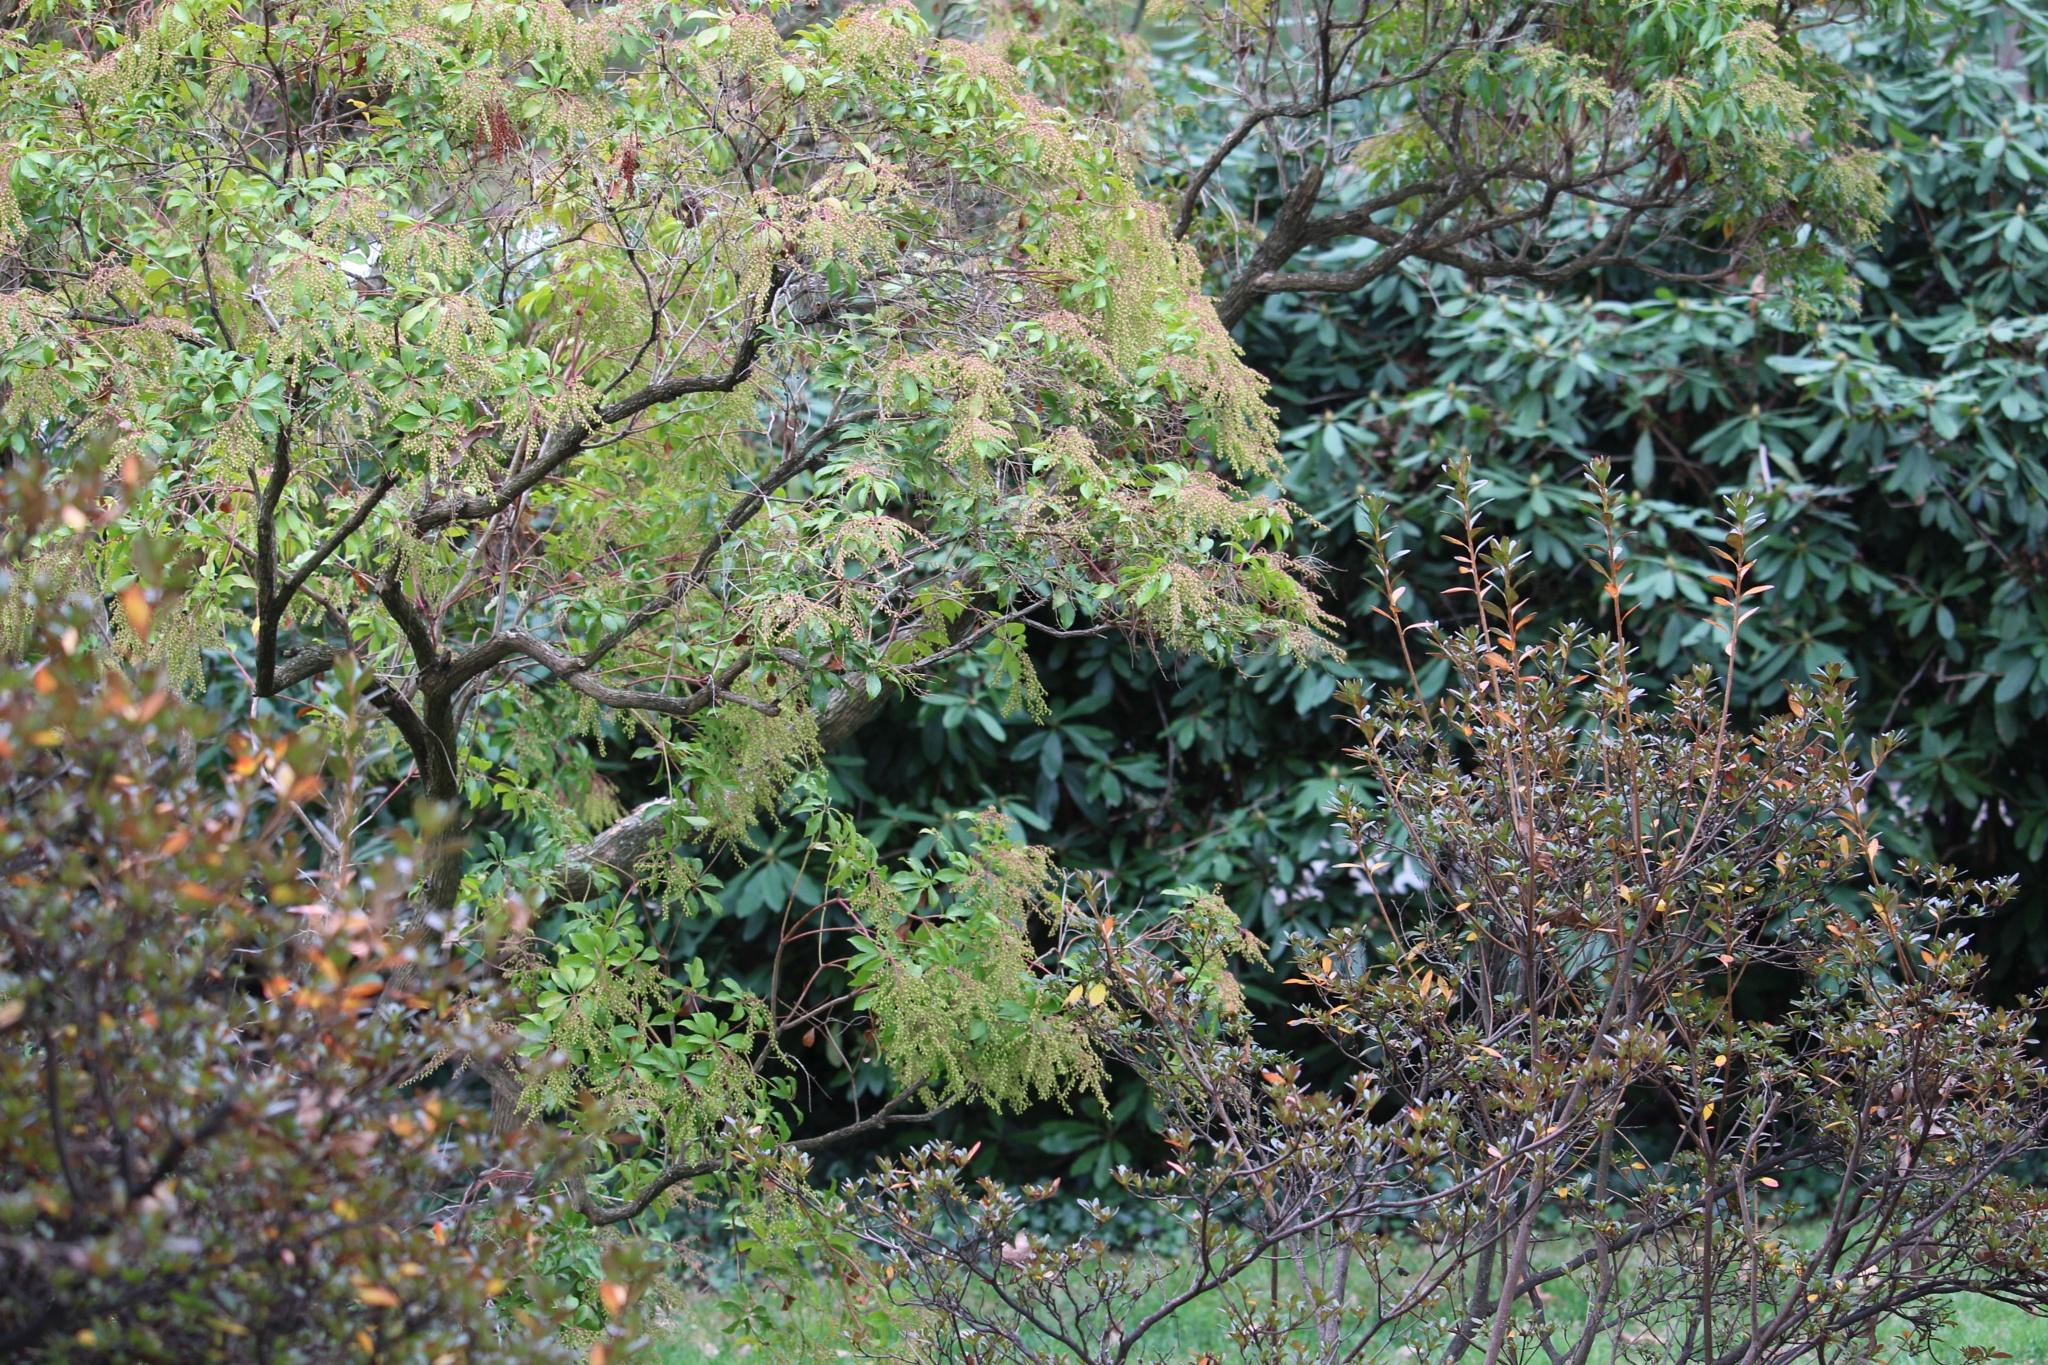 December Greens by VanWyck